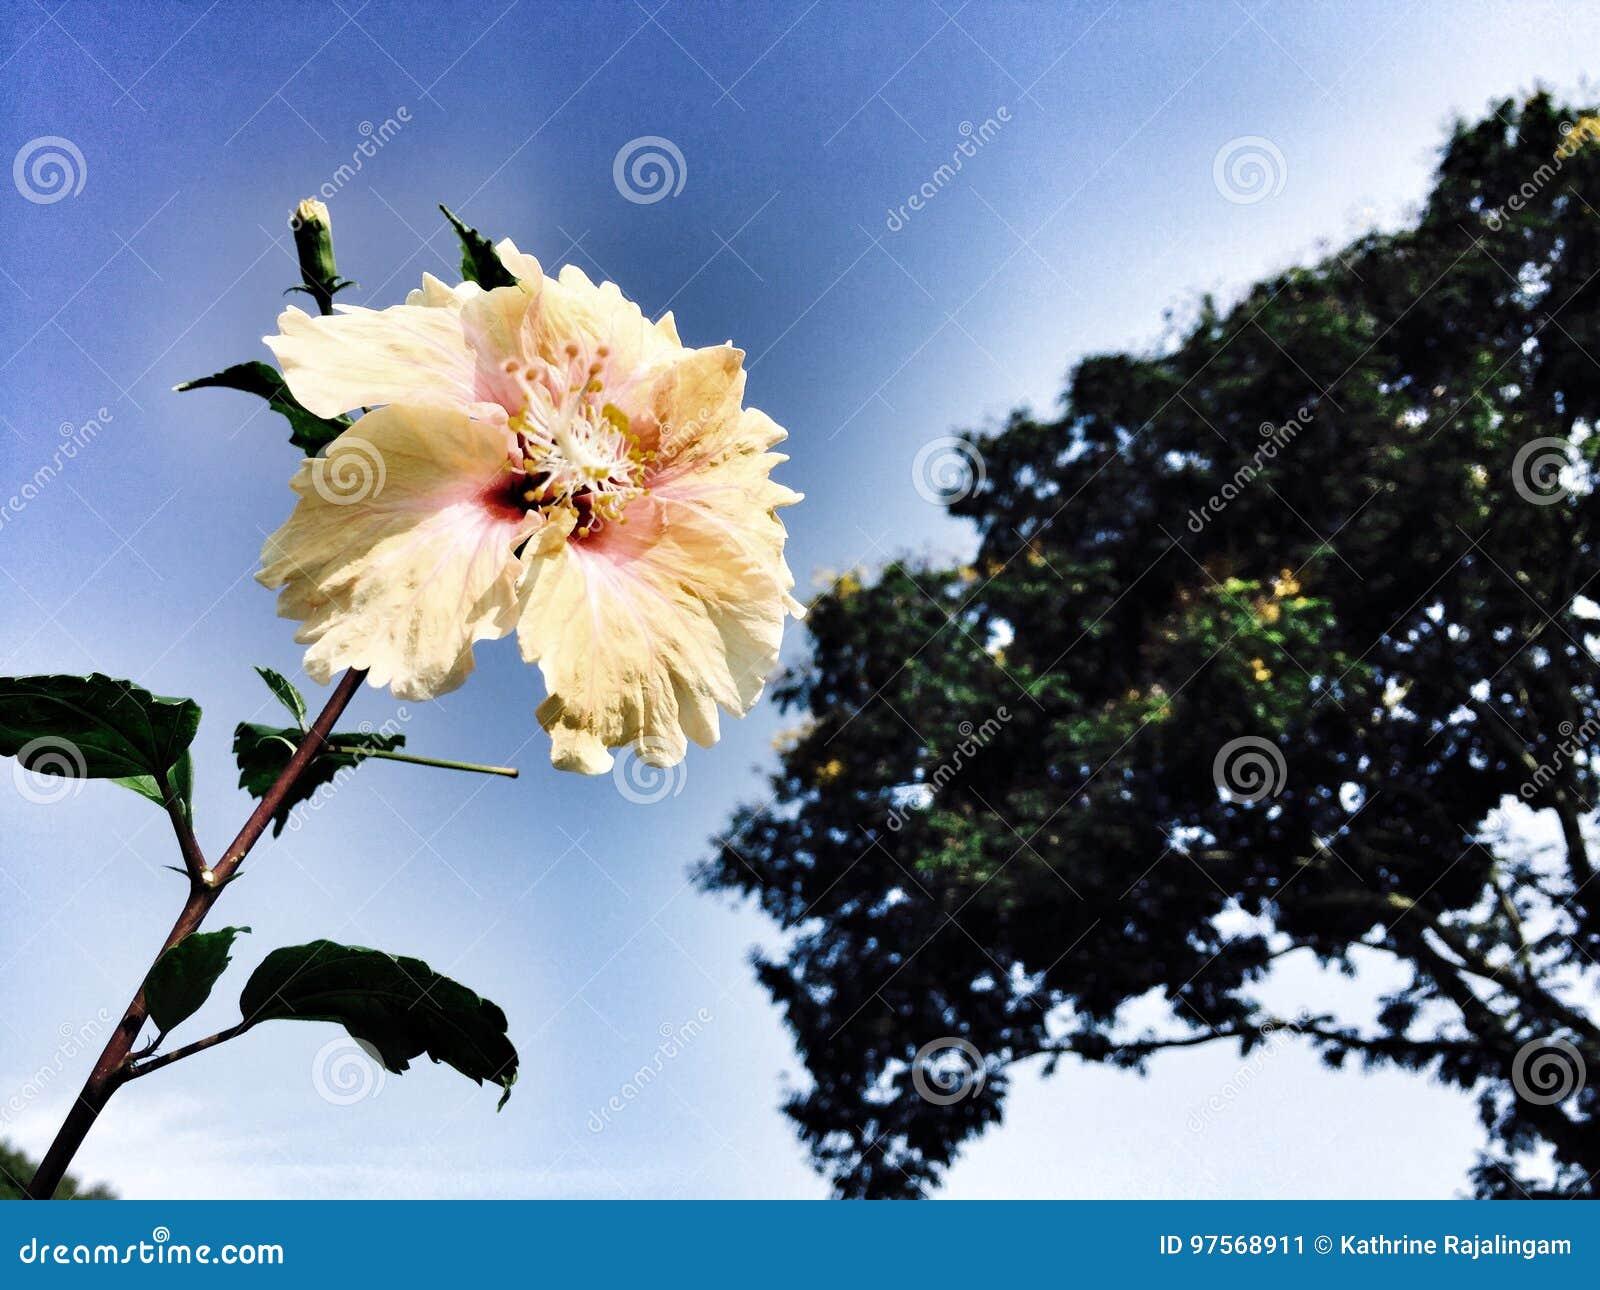 Hibiscus Stock Image Image Of Flowersforfunerals Extracts 97568911